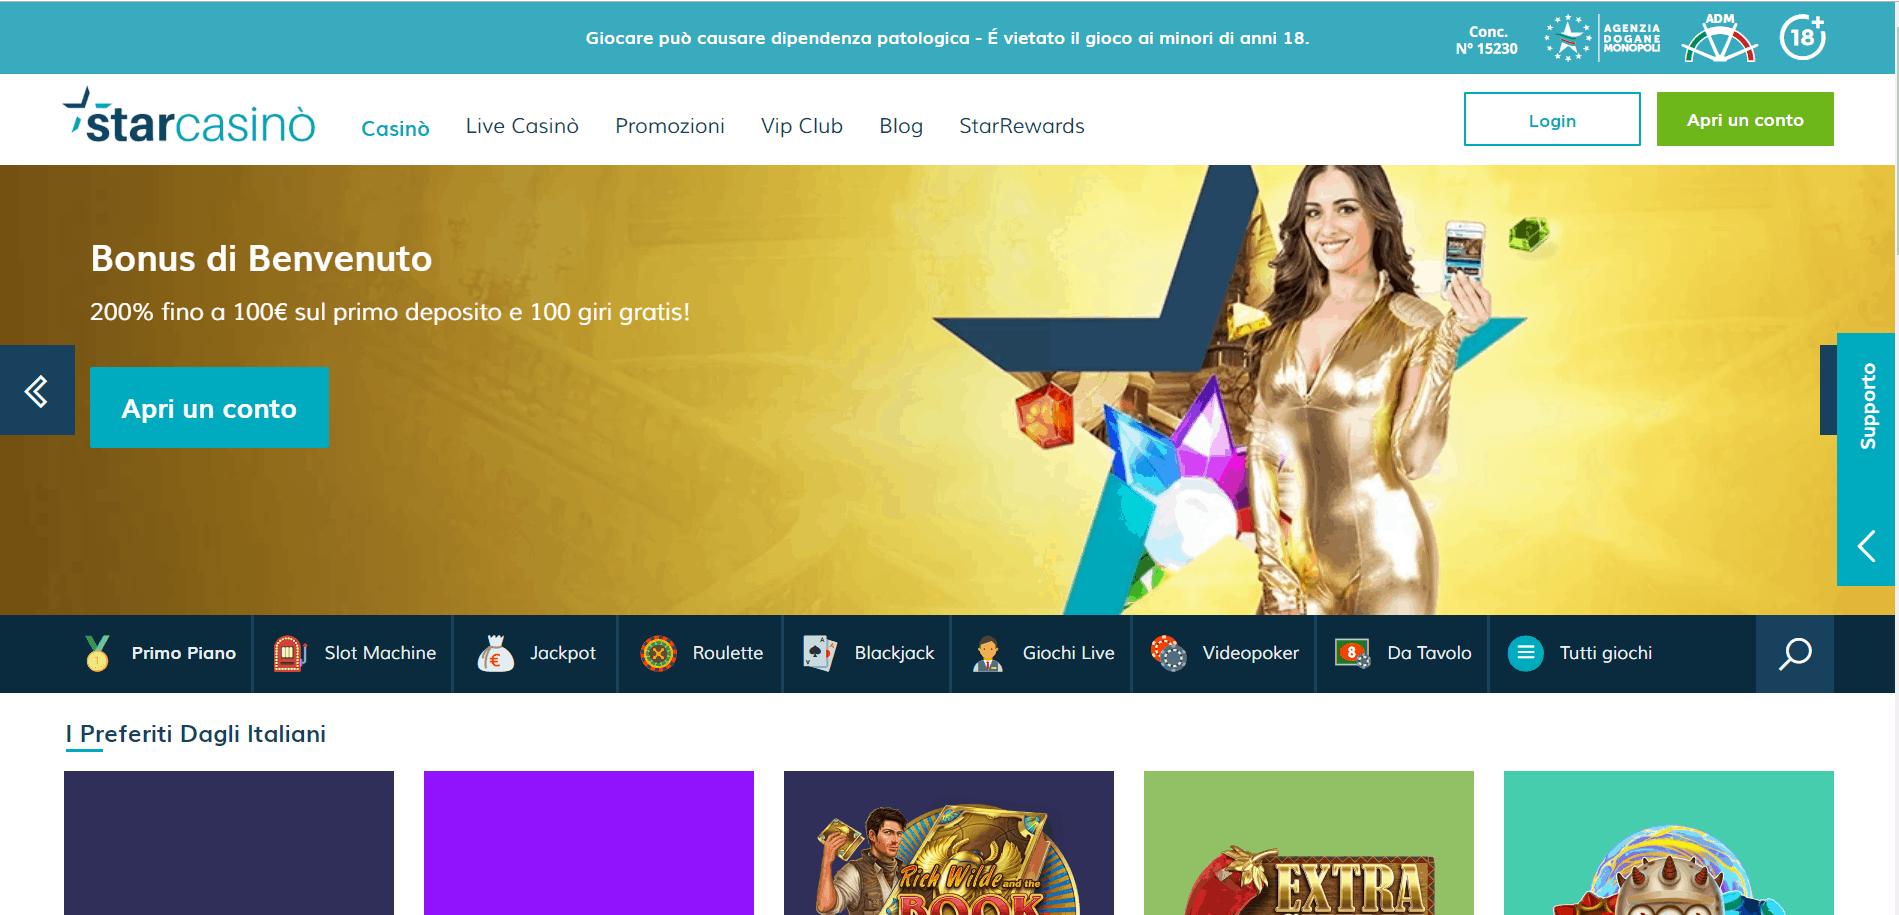 Starcasino desktop